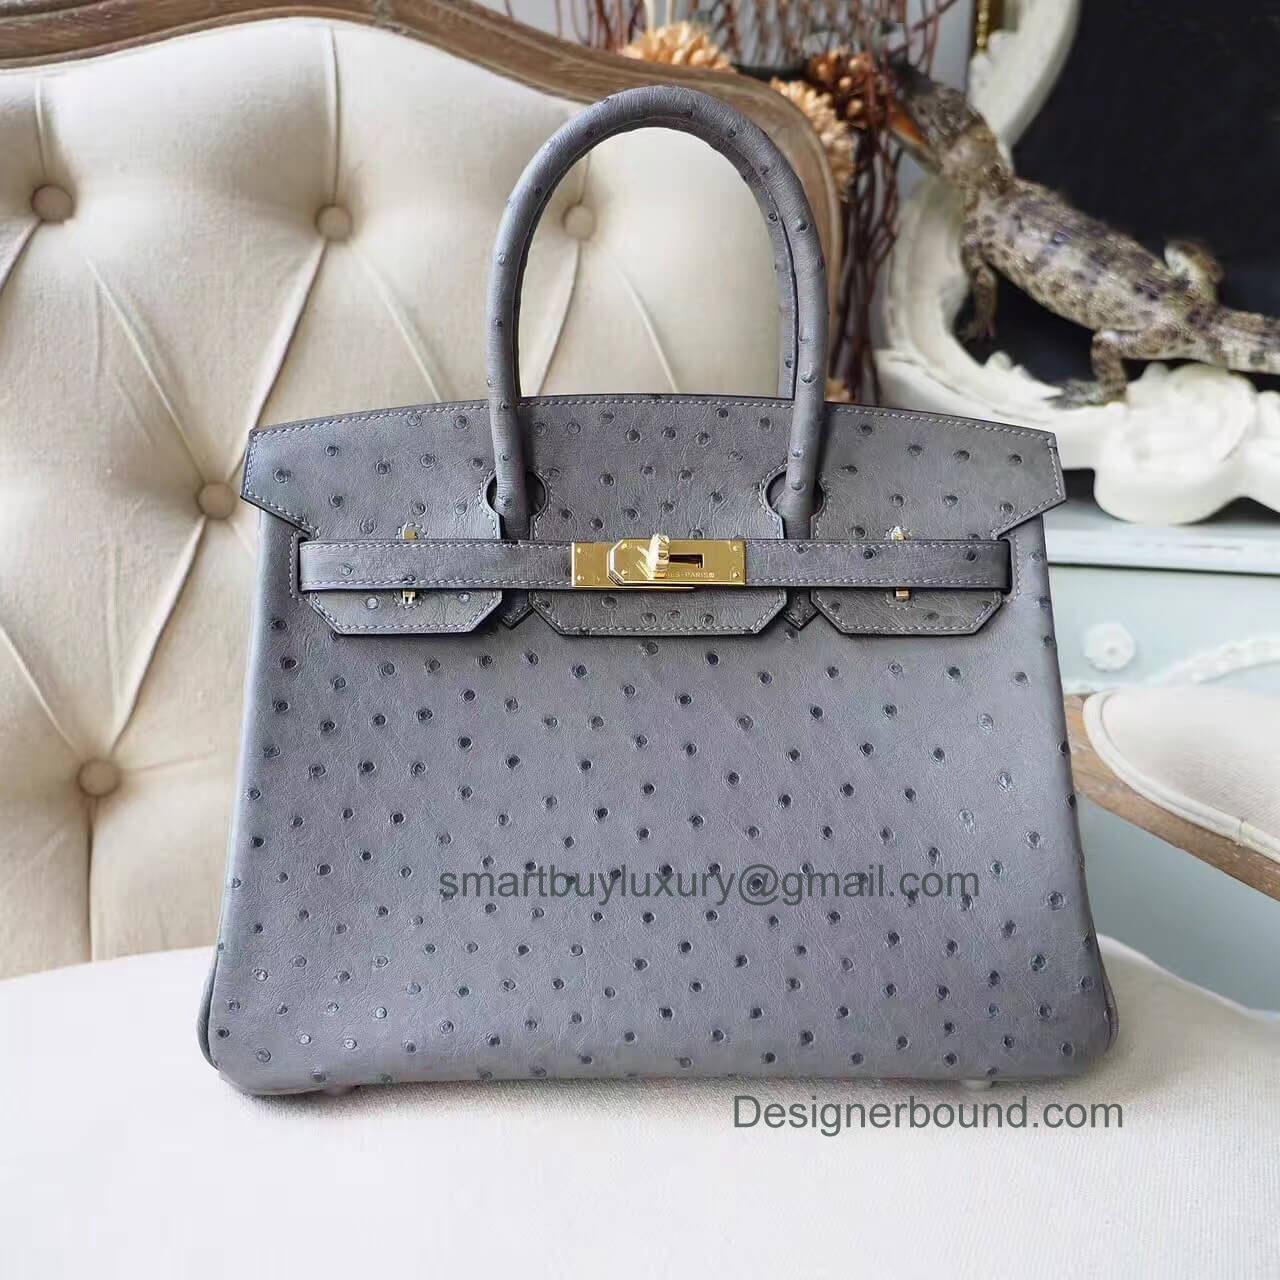 3bbb2cd644ea Hermes Birkin 30 Handbag in ck82 Gris Agate Ostrich GHW - Hermes Replica